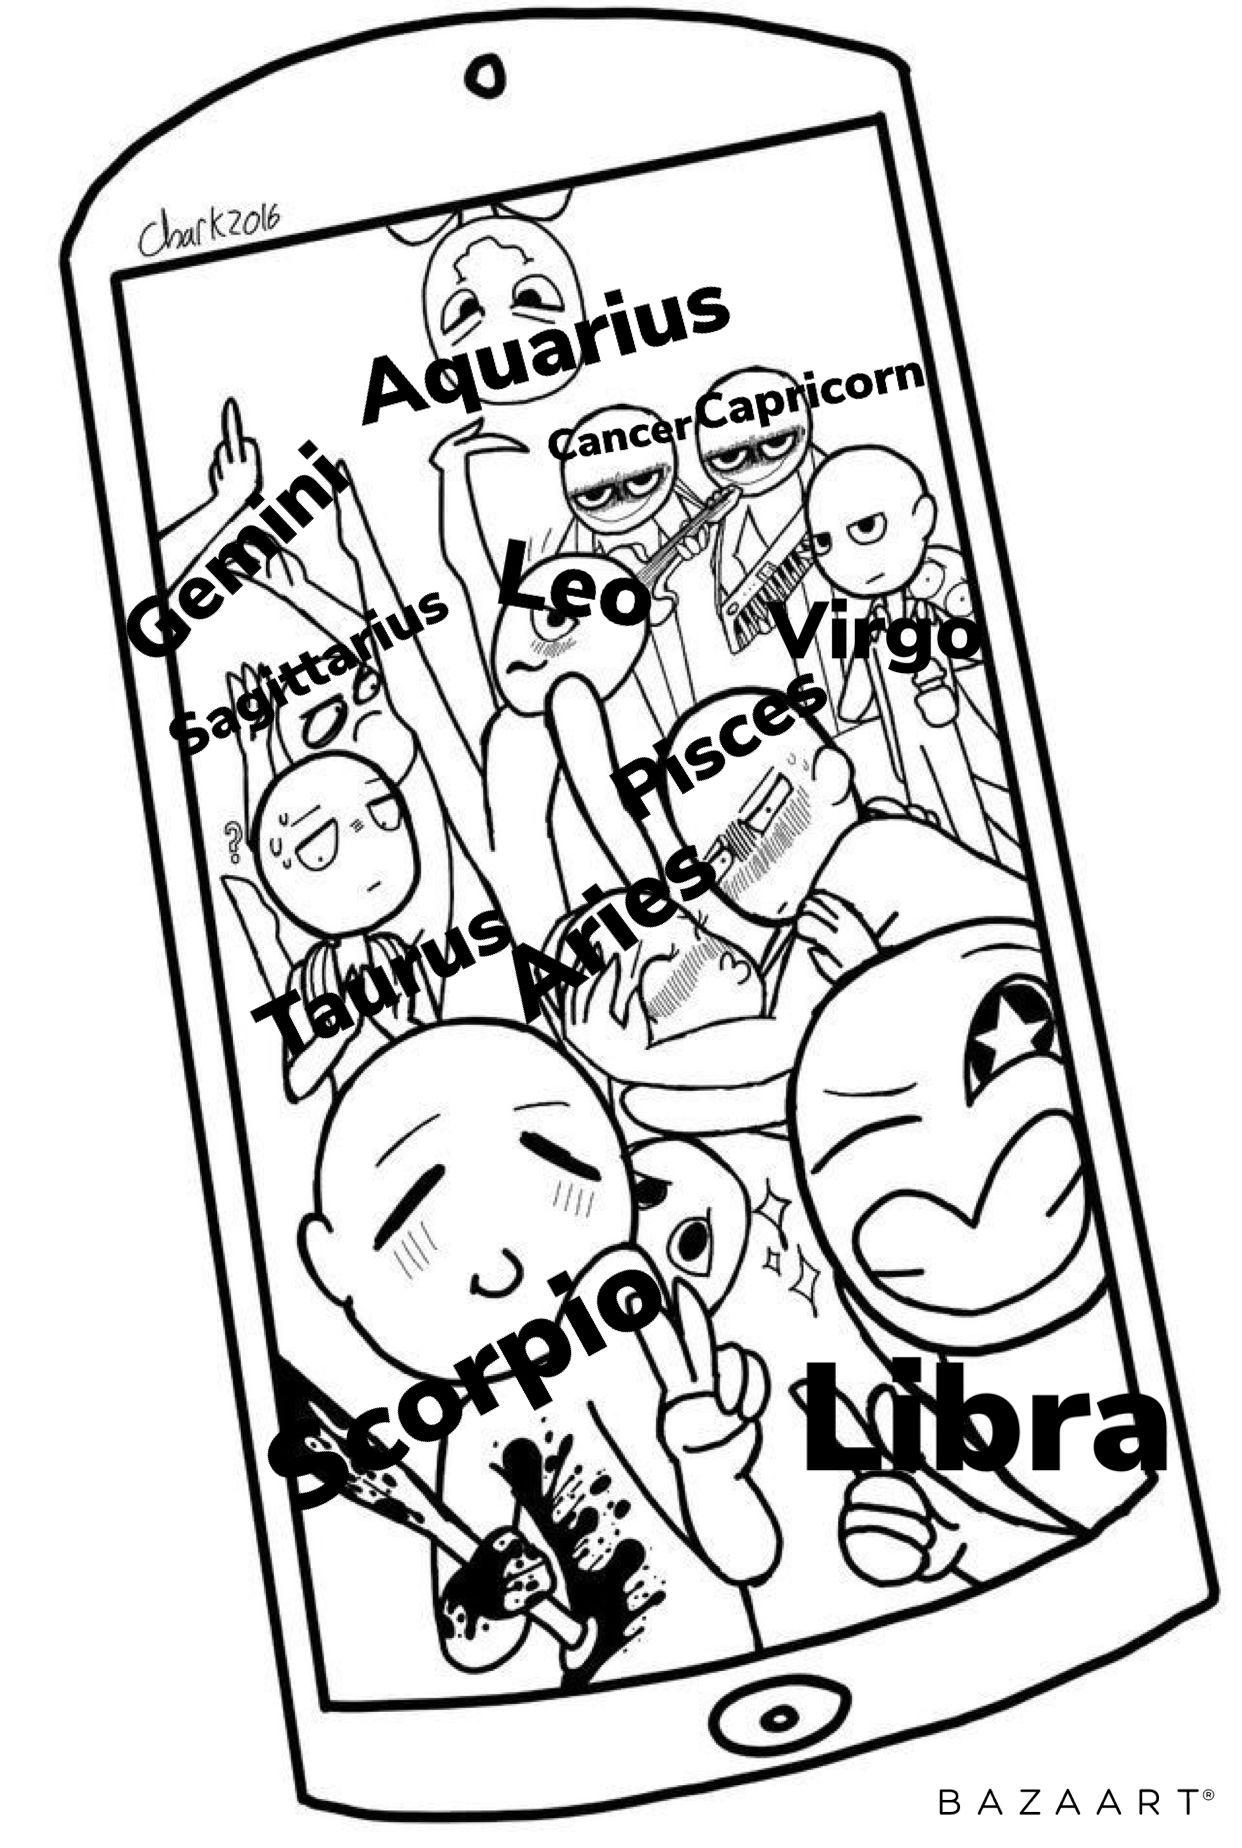 Pin By Sorian Aif On Zodiac Dessin Zodiac Signs Funny Zodiac Signs Gemini Zodiac Signs Aquarius